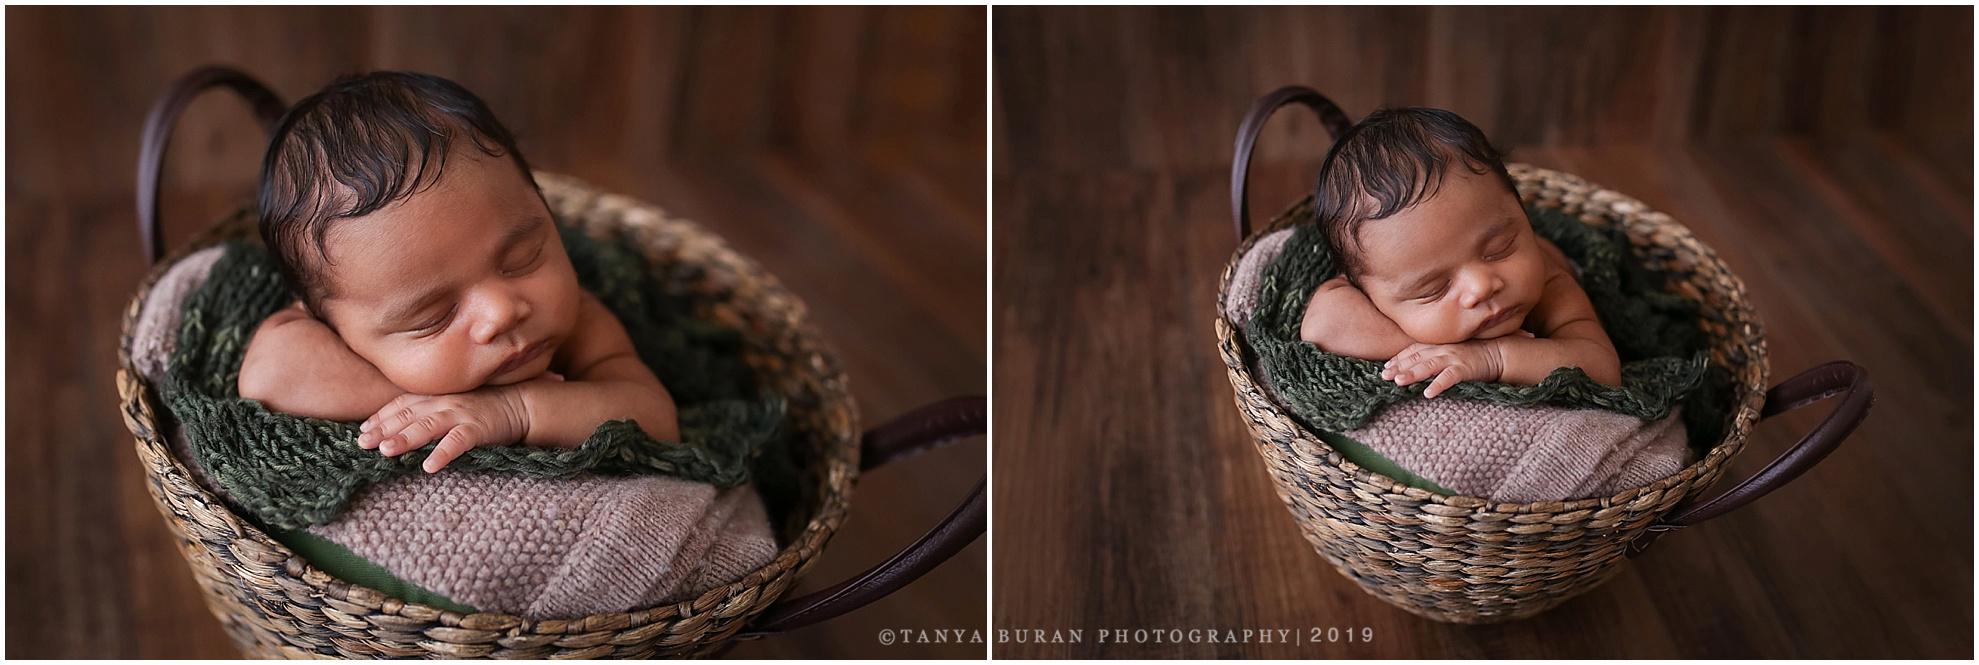 Newborn session aiden 4 weeks old jersey city newborn photographer tanya buran photography